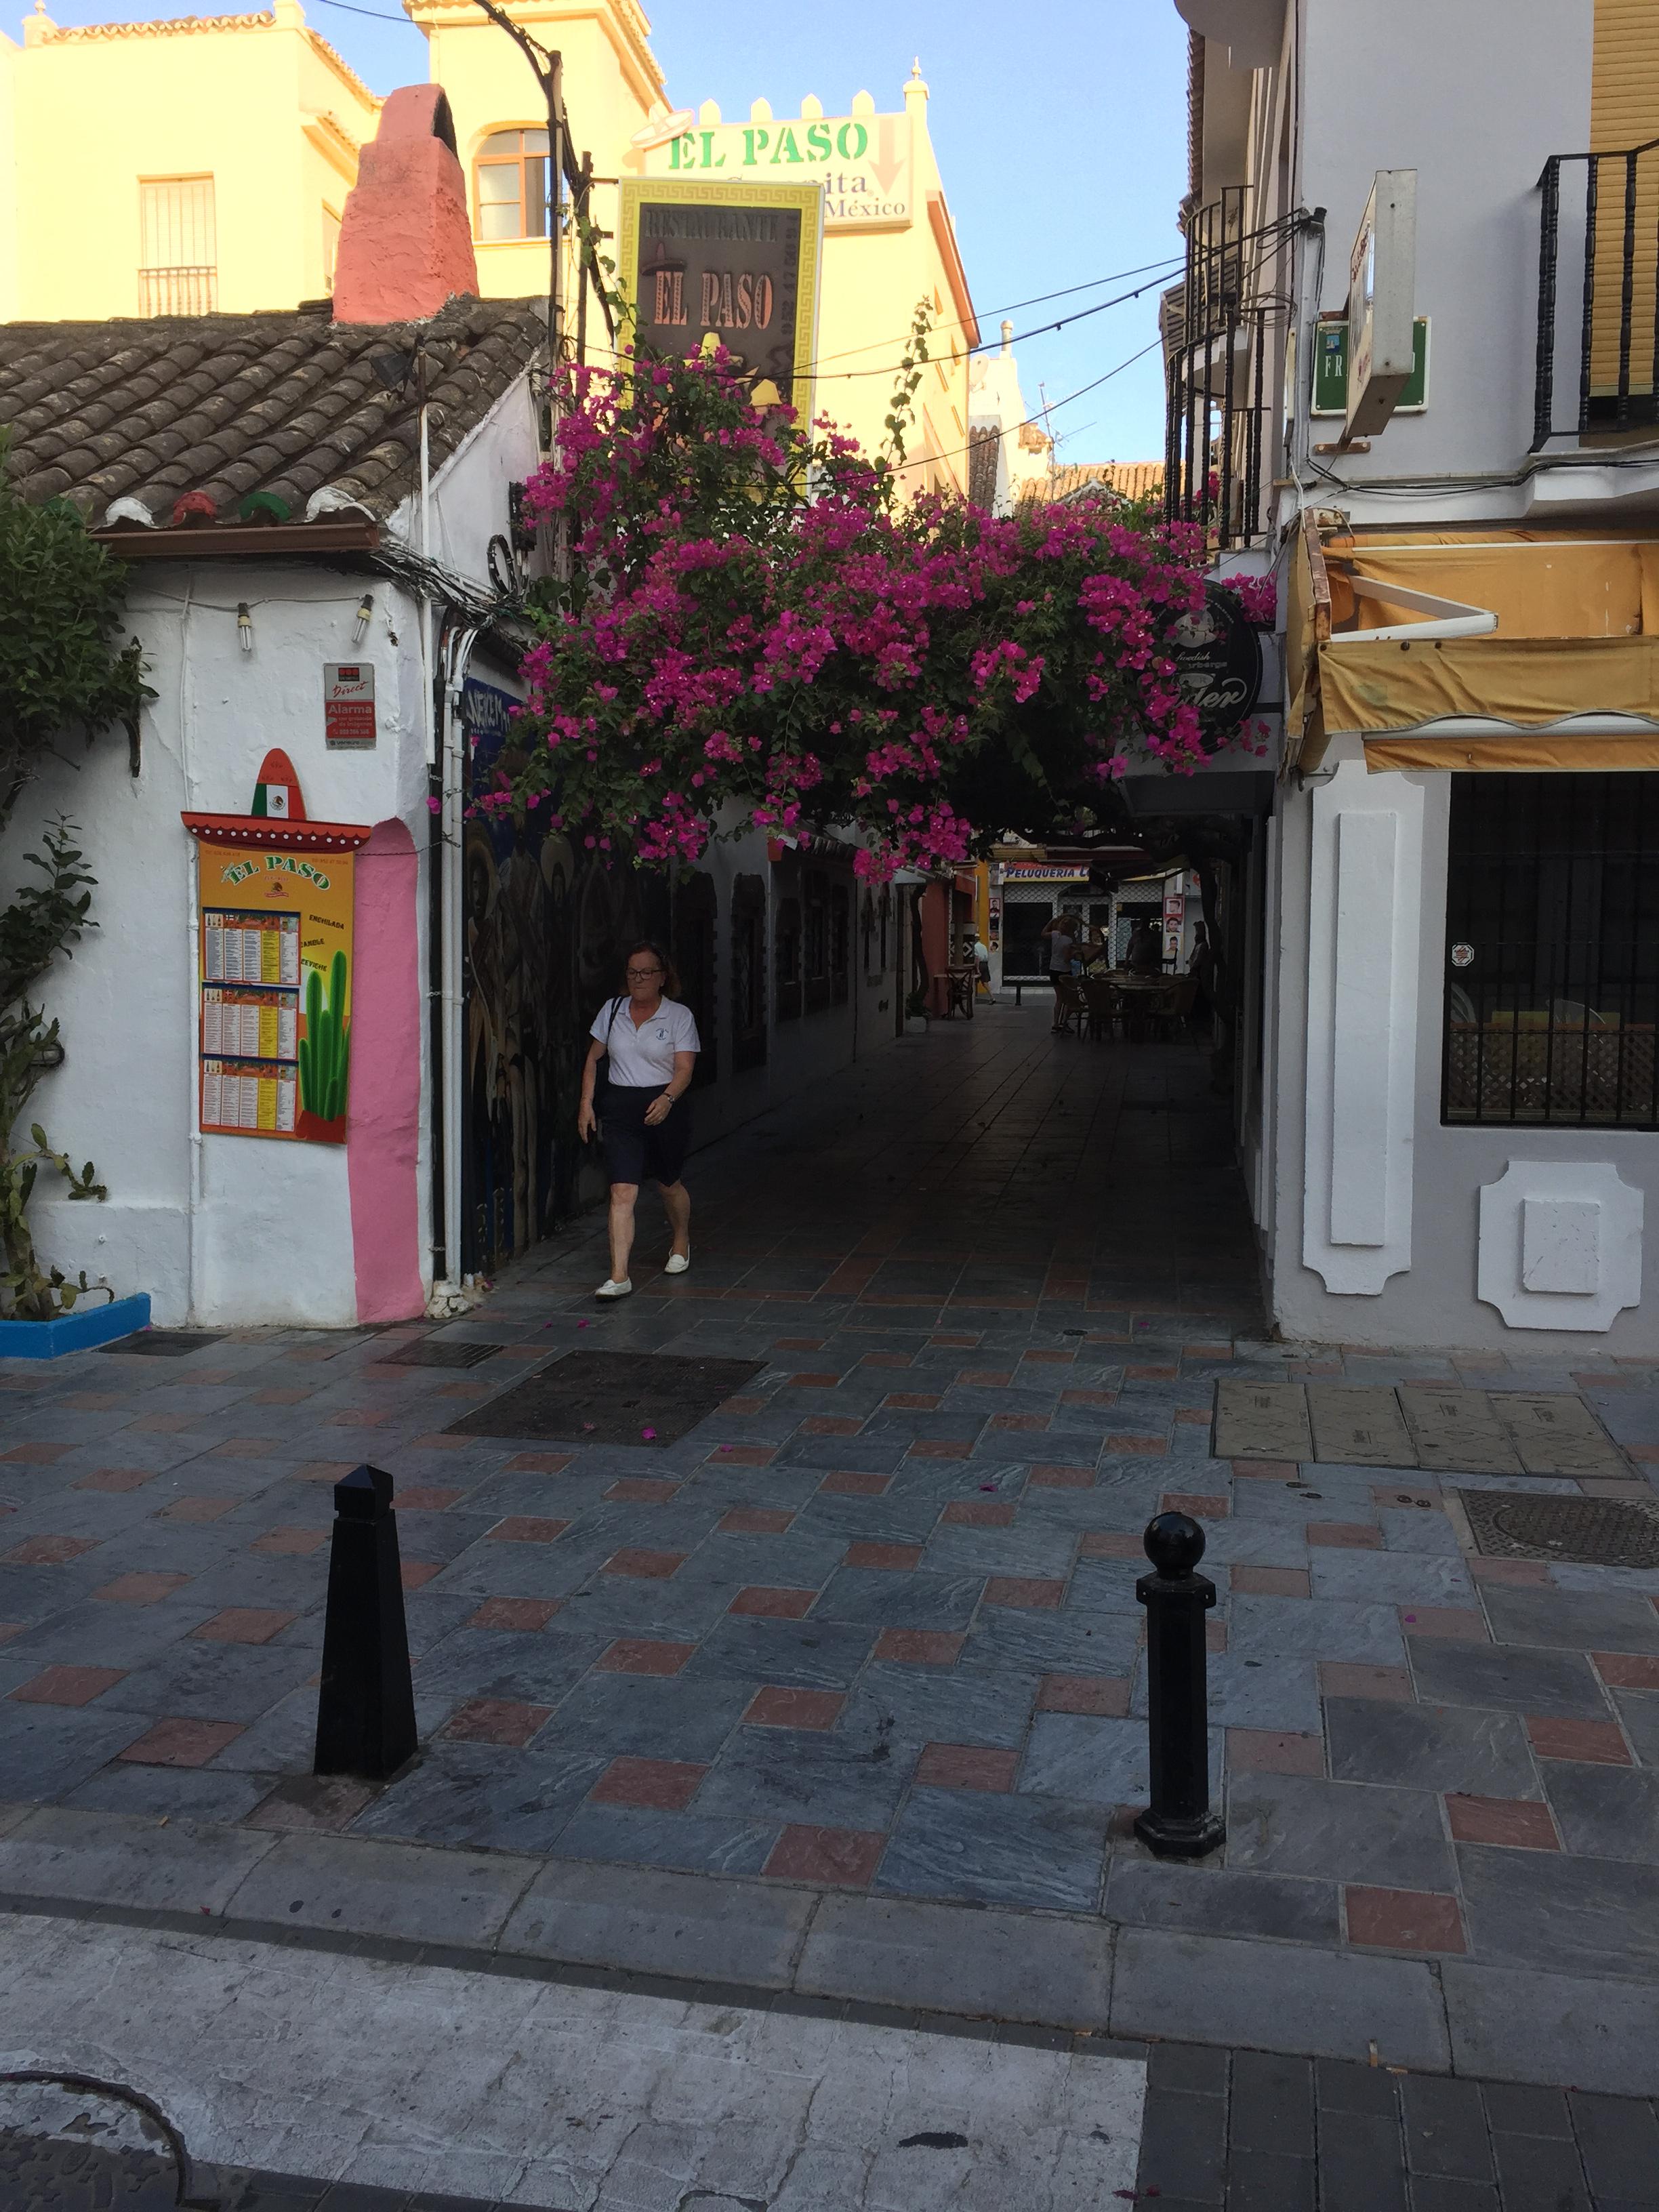 IMG_0286 GADE I FUENGIROLA 26-07-2019